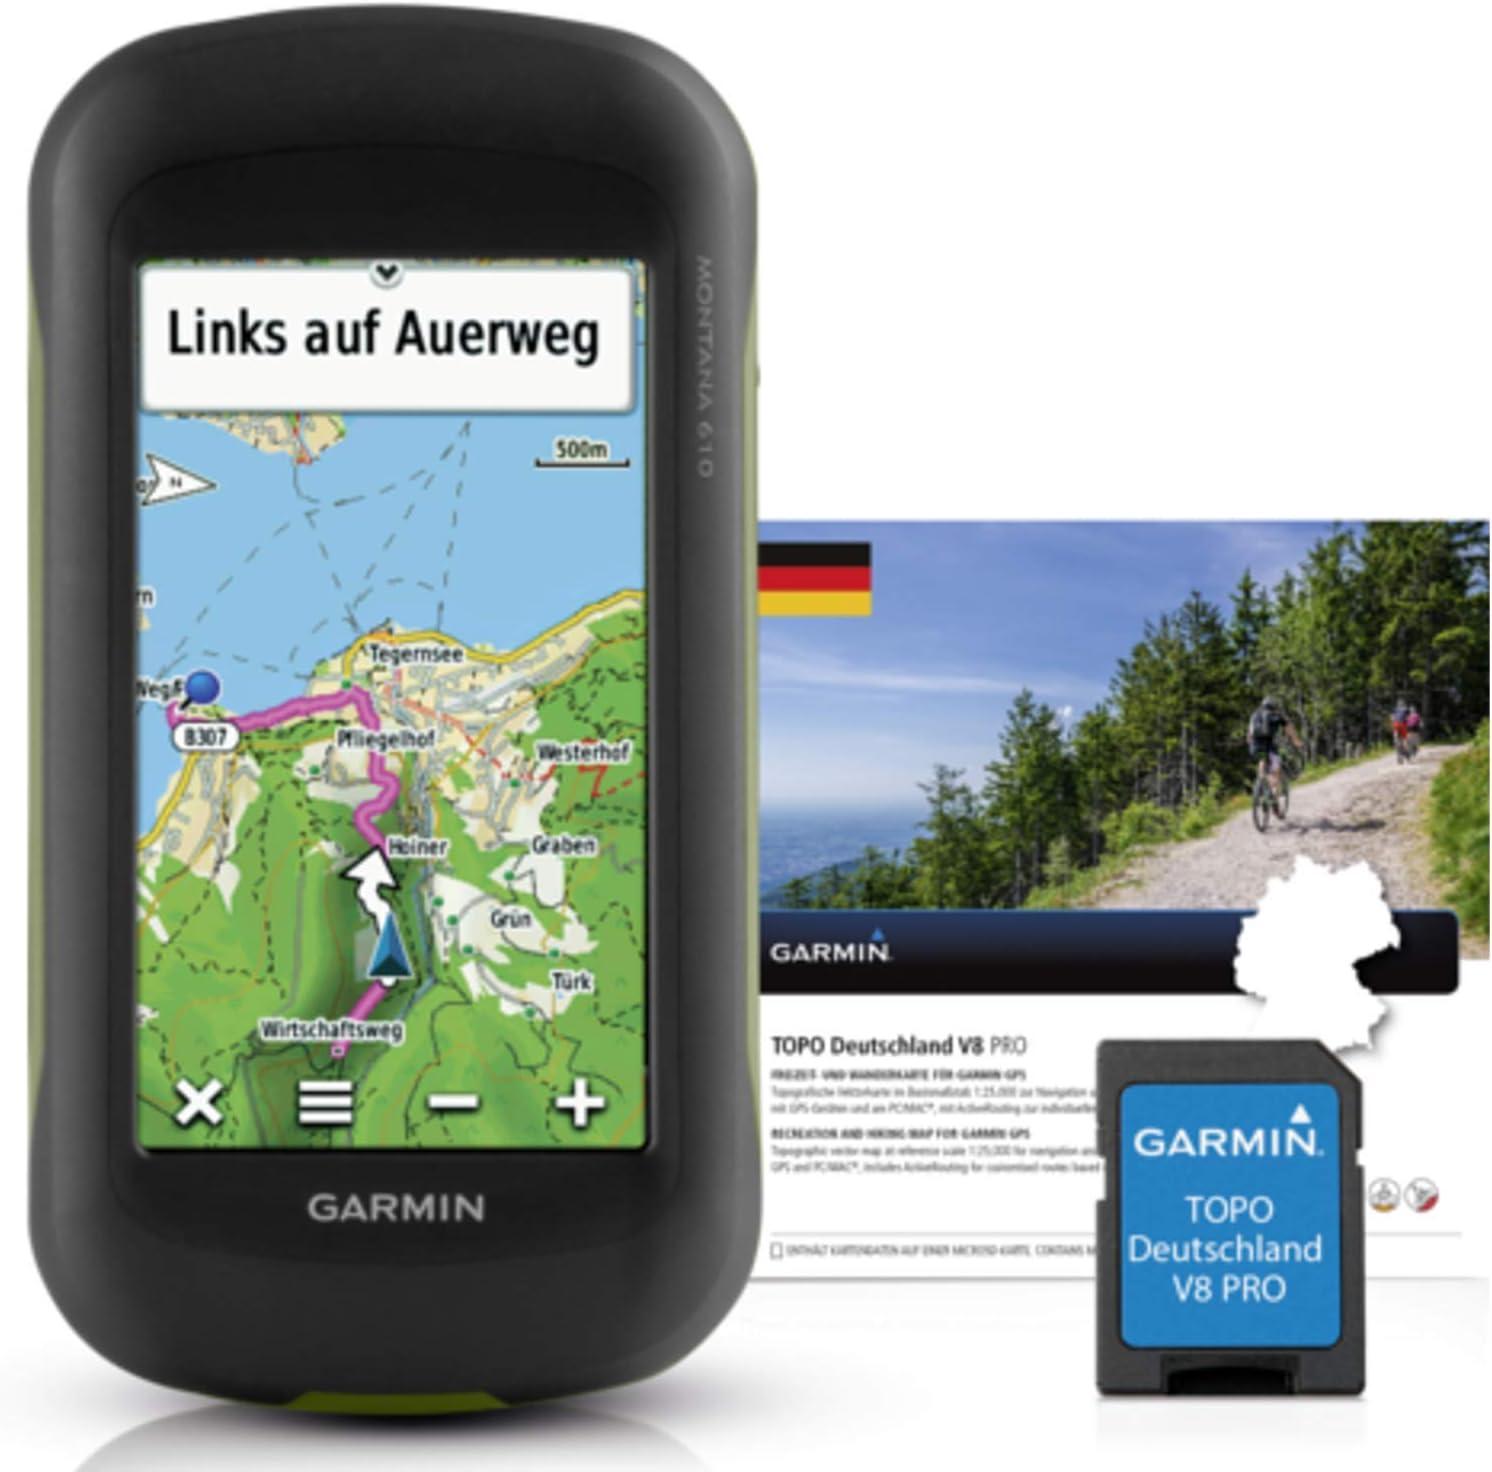 Garmin Uni Montana 610 + Topo Alemania V8 Pro Outdoor Dispositivo de navegación, Negro, One Size: Amazon.es: Deportes y aire libre